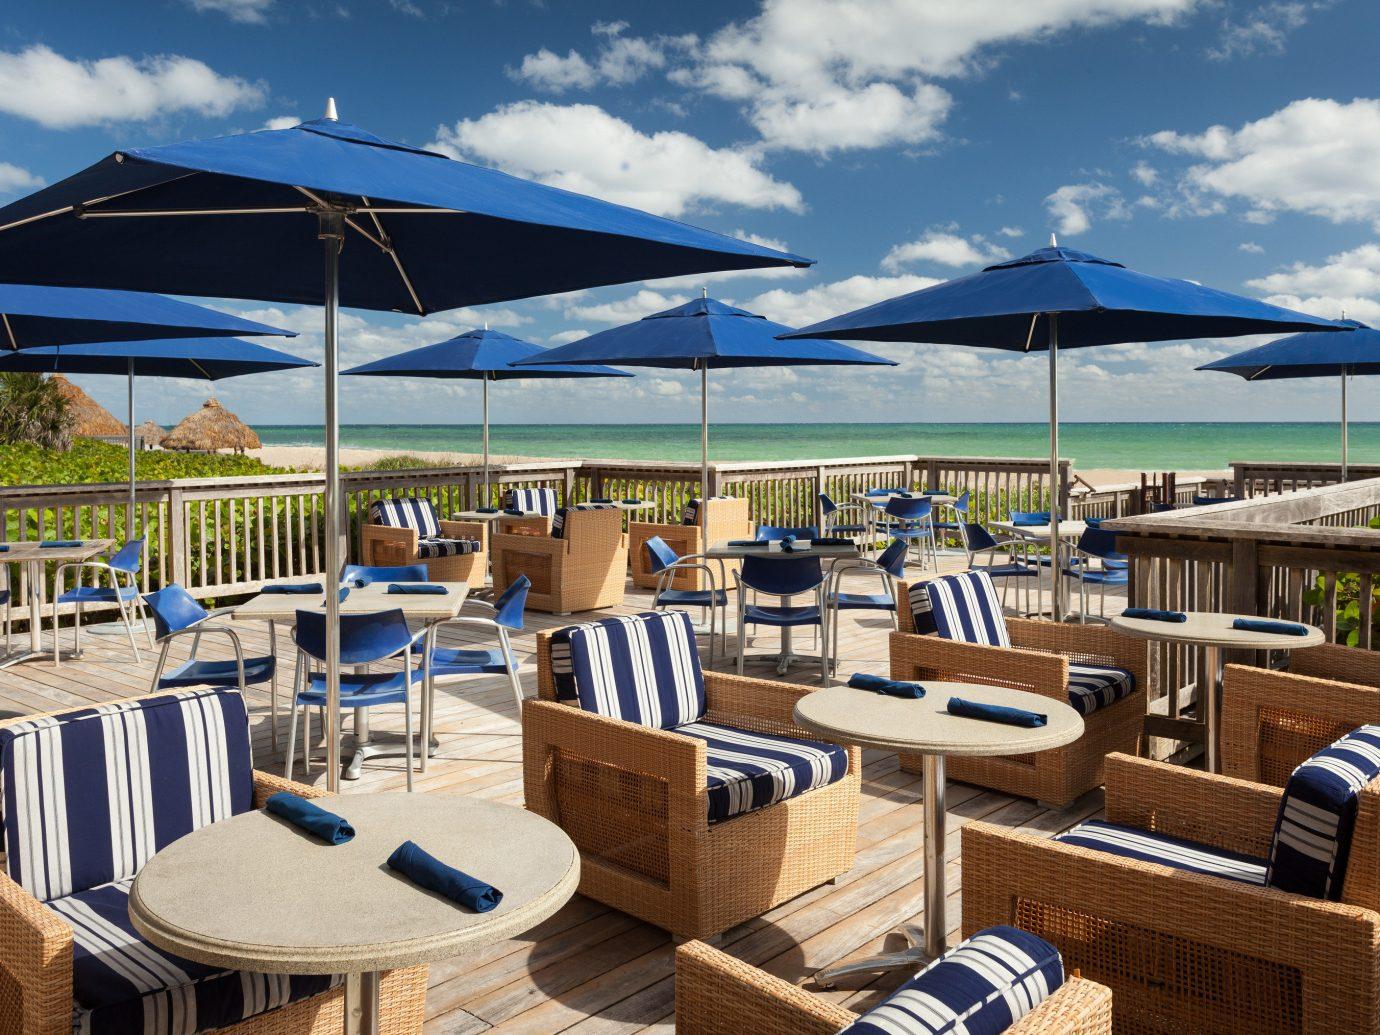 Food + Drink chair umbrella sky outdoor lawn Beach Resort vacation restaurant vehicle marina dock set furniture day Deck shade several